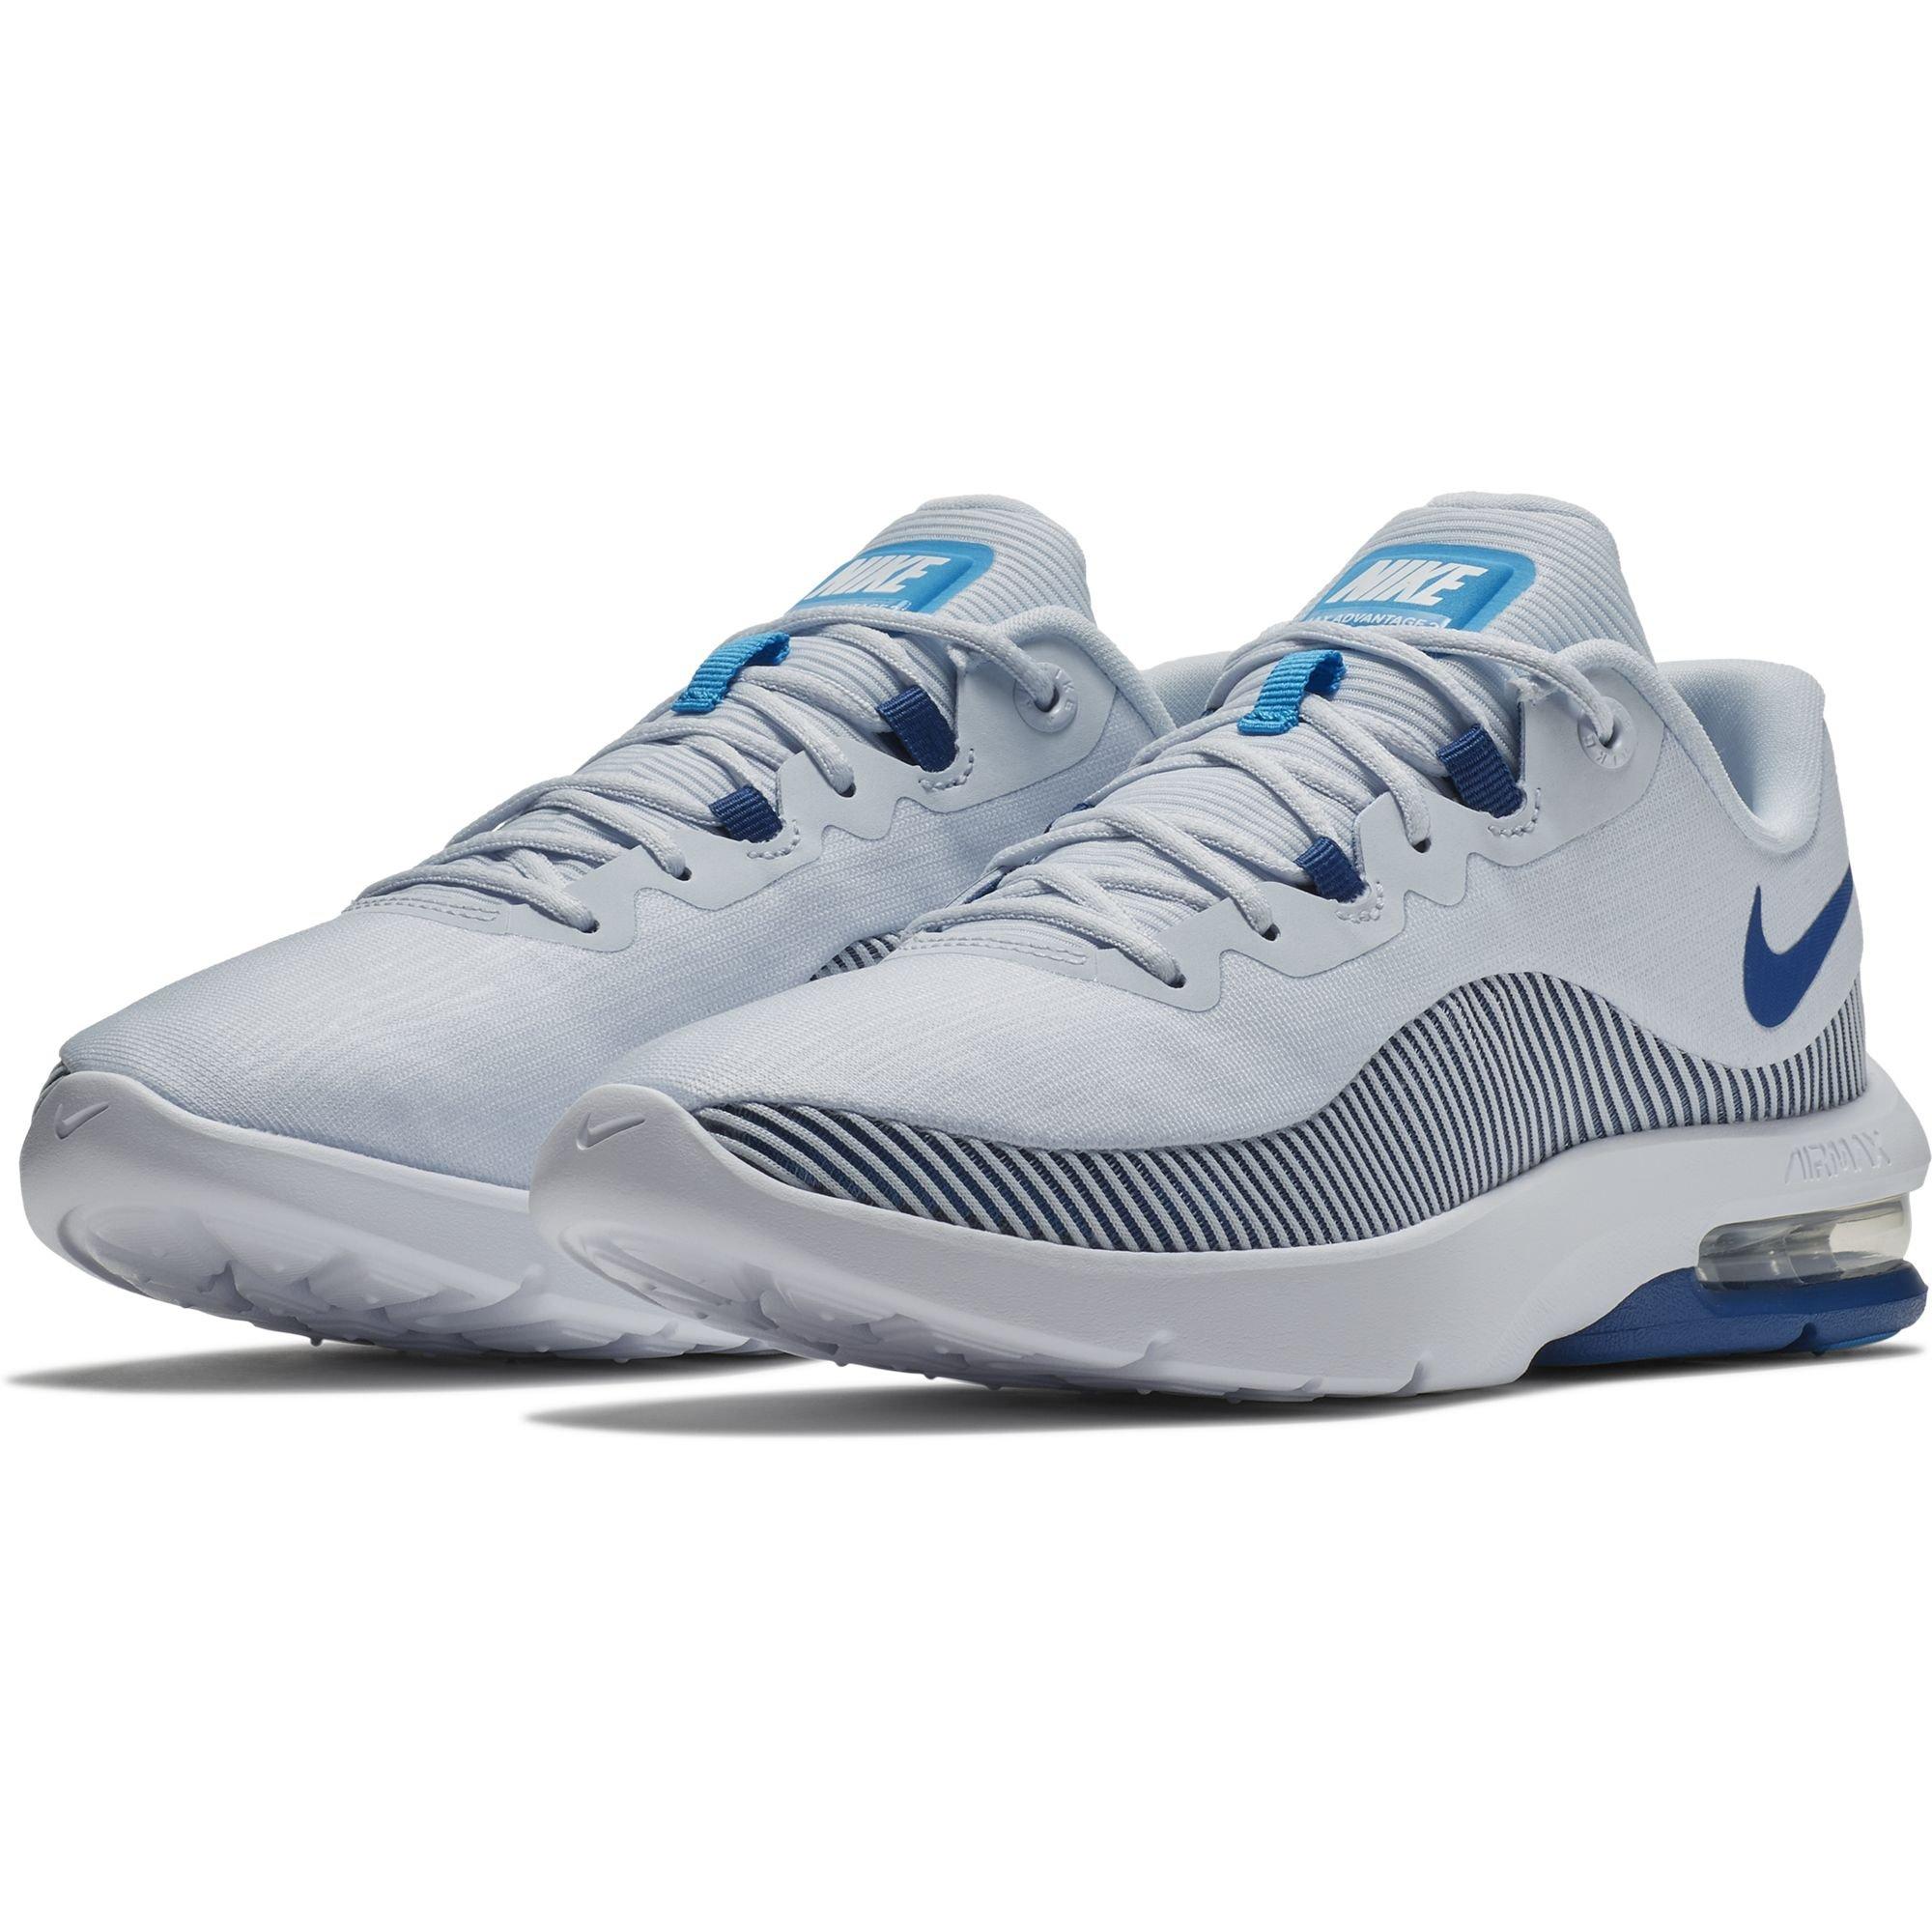 6d5bcf7d596 Galleon - NIKE Women s Air Max Advantage 2 Running Shoes